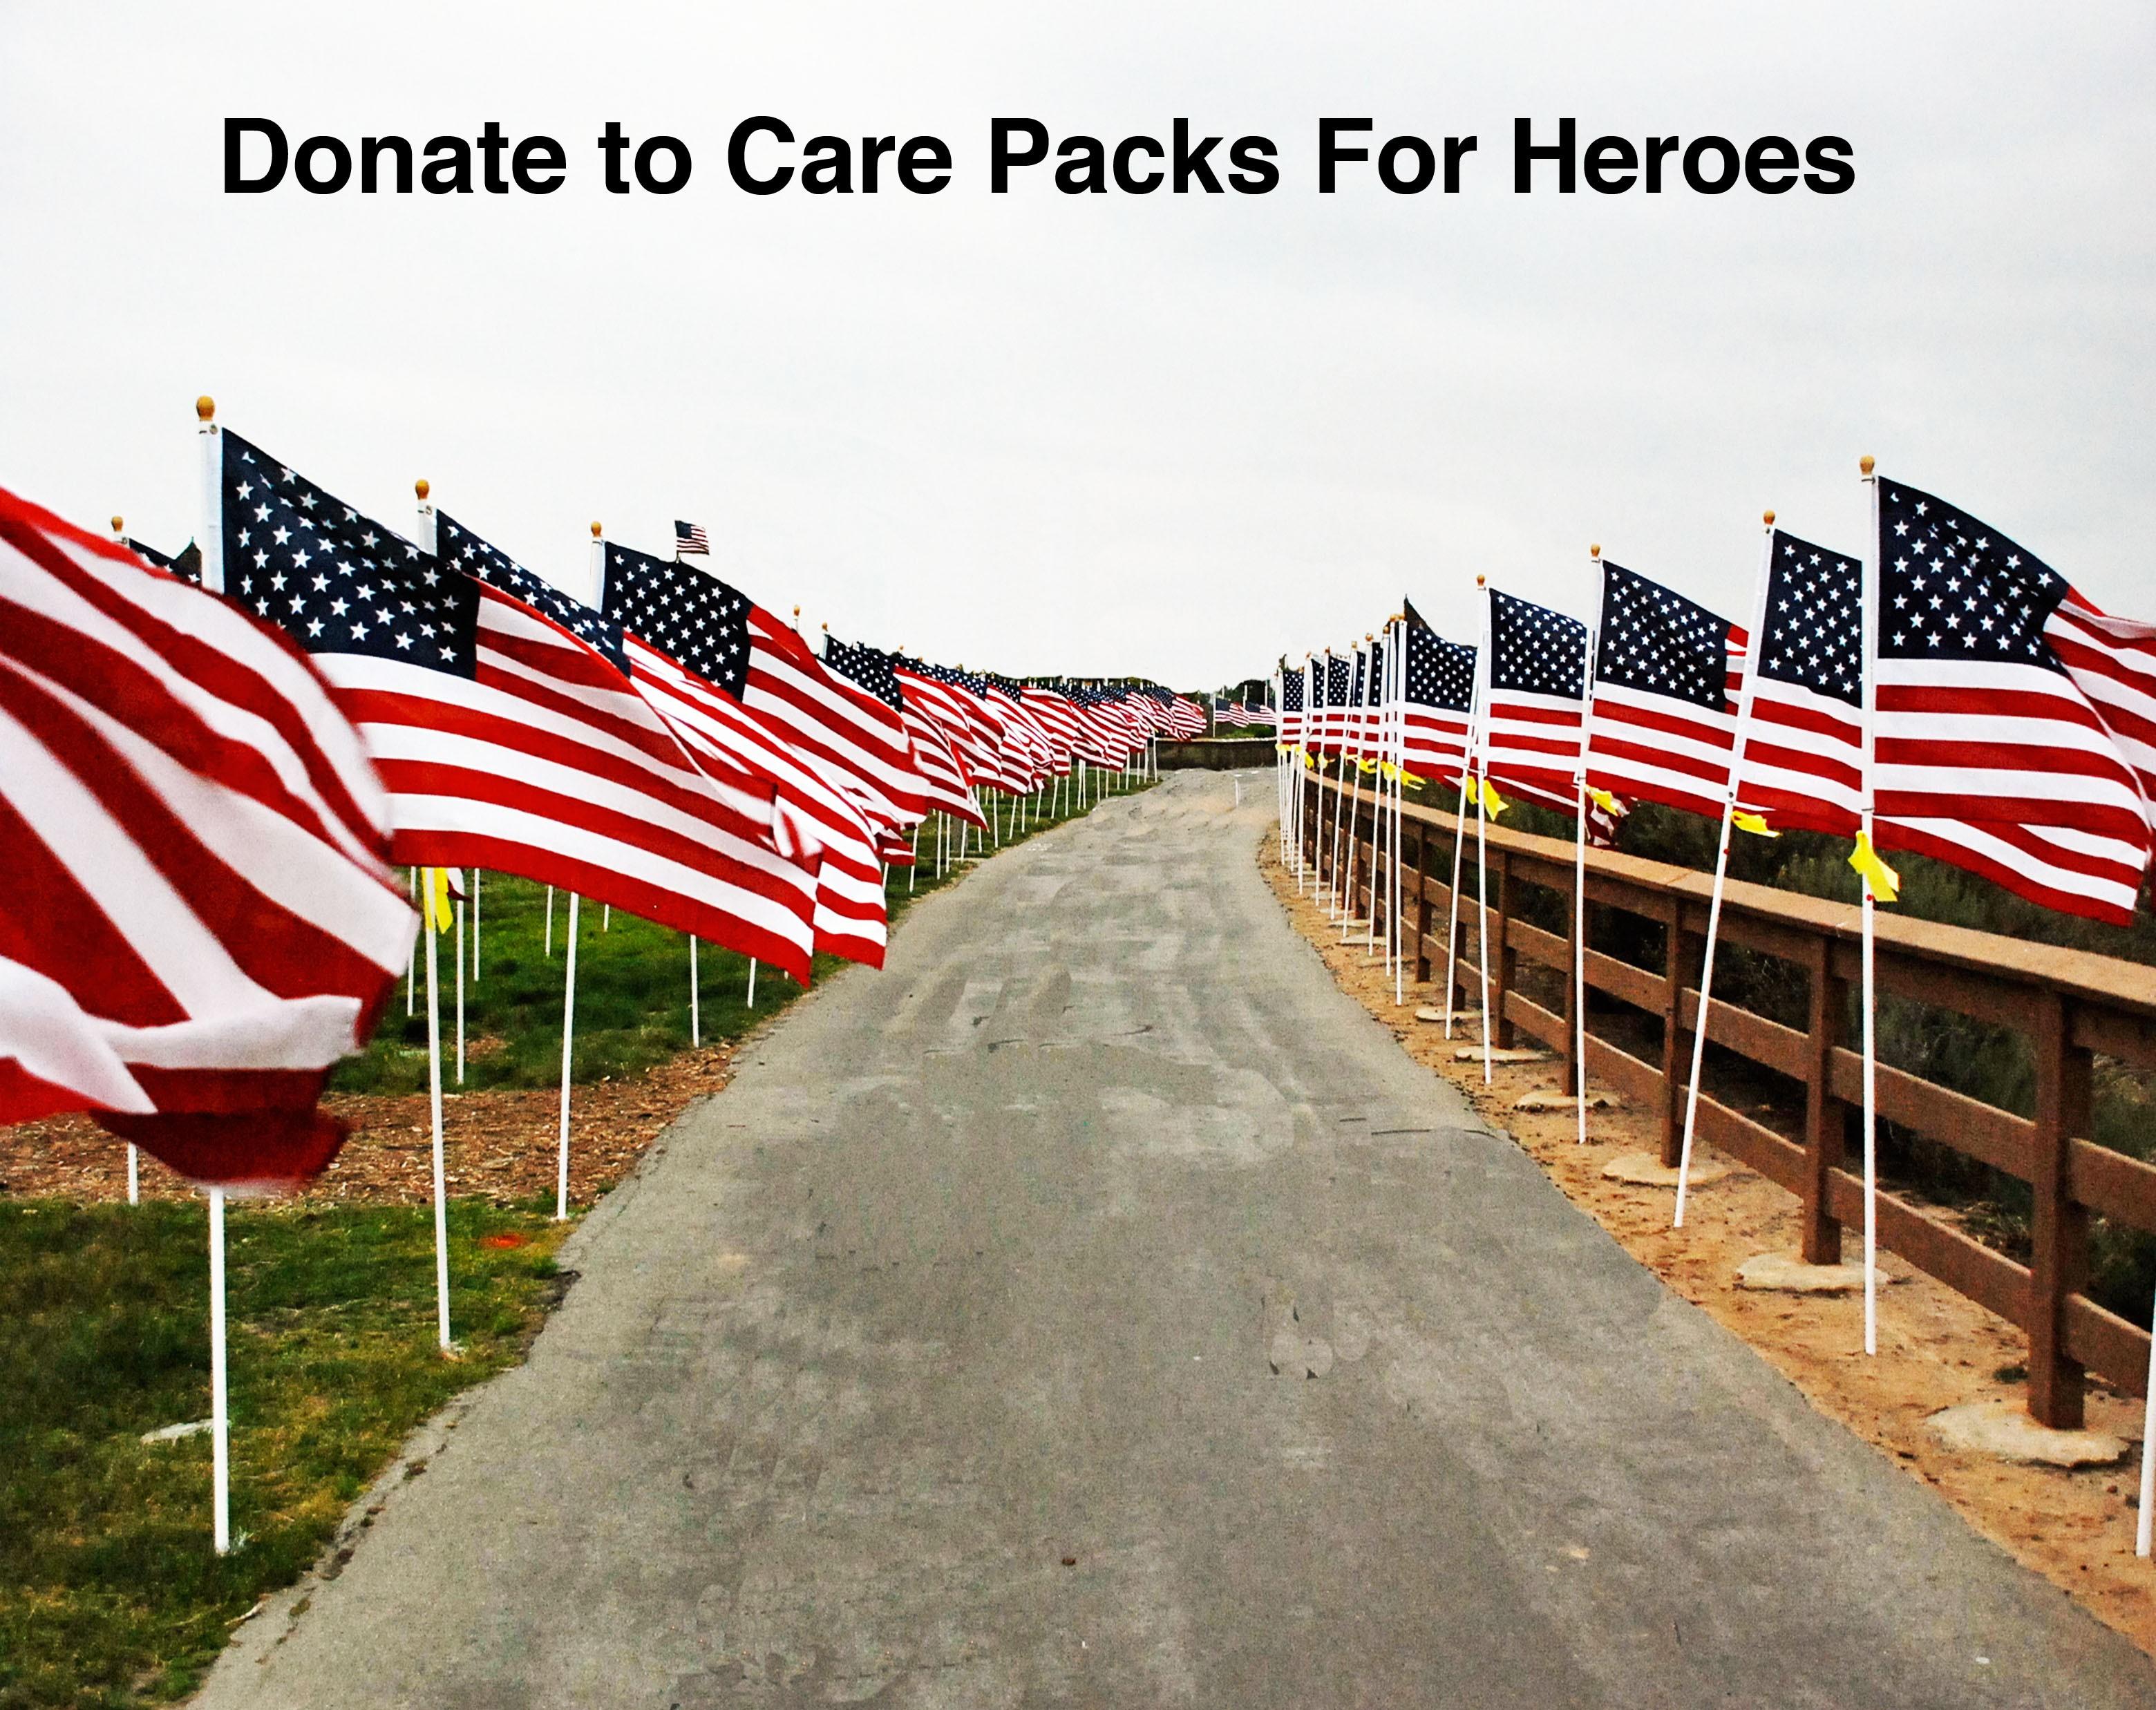 DonationImage